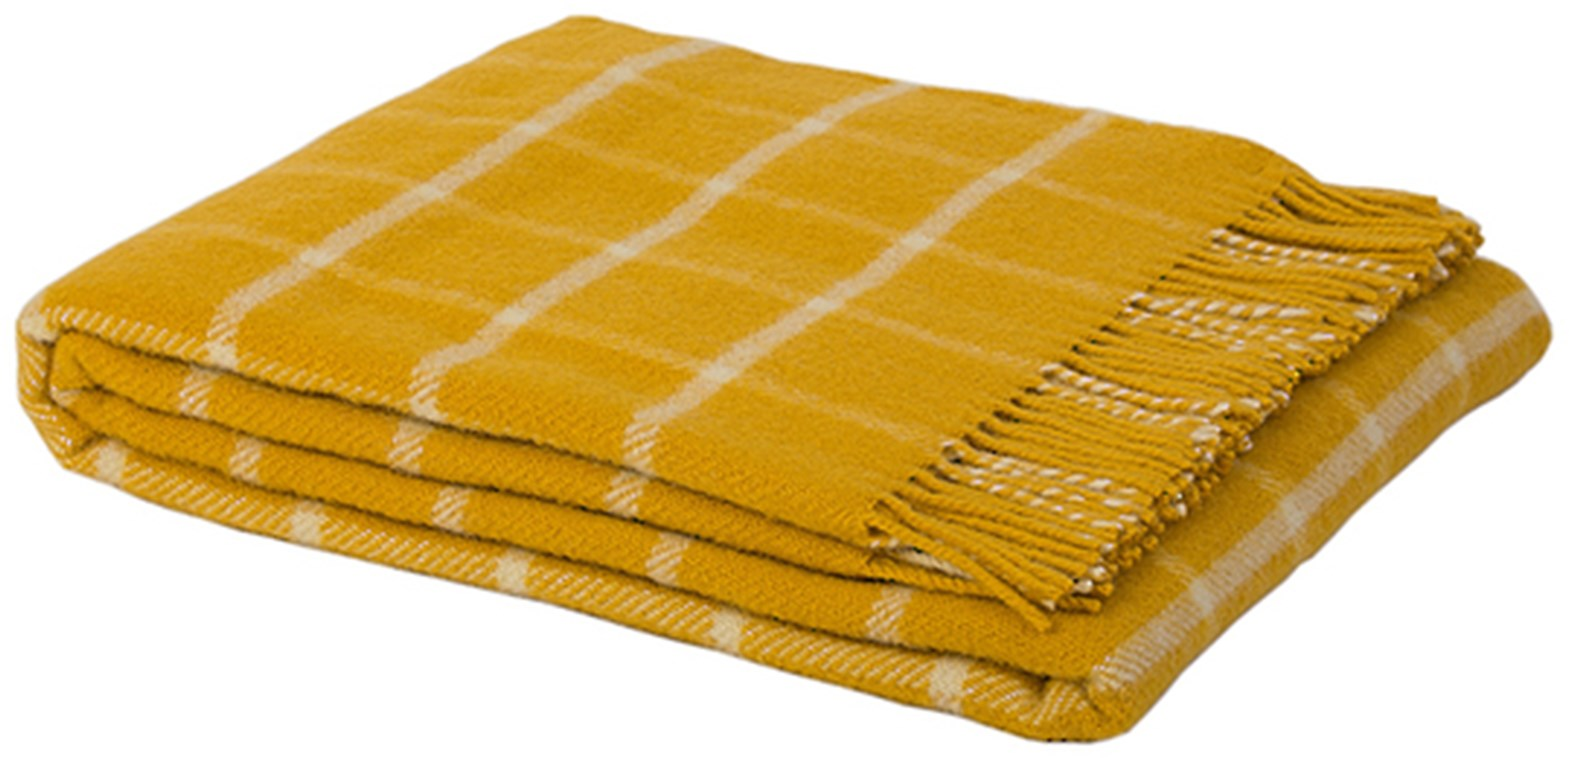 Throw, $220, by [Warwick Fabrics](https://www.warwick.co.nz/shop/All+Collections/Shetland+Throws/LAXO+%28THROW%29+YELLOW.html).